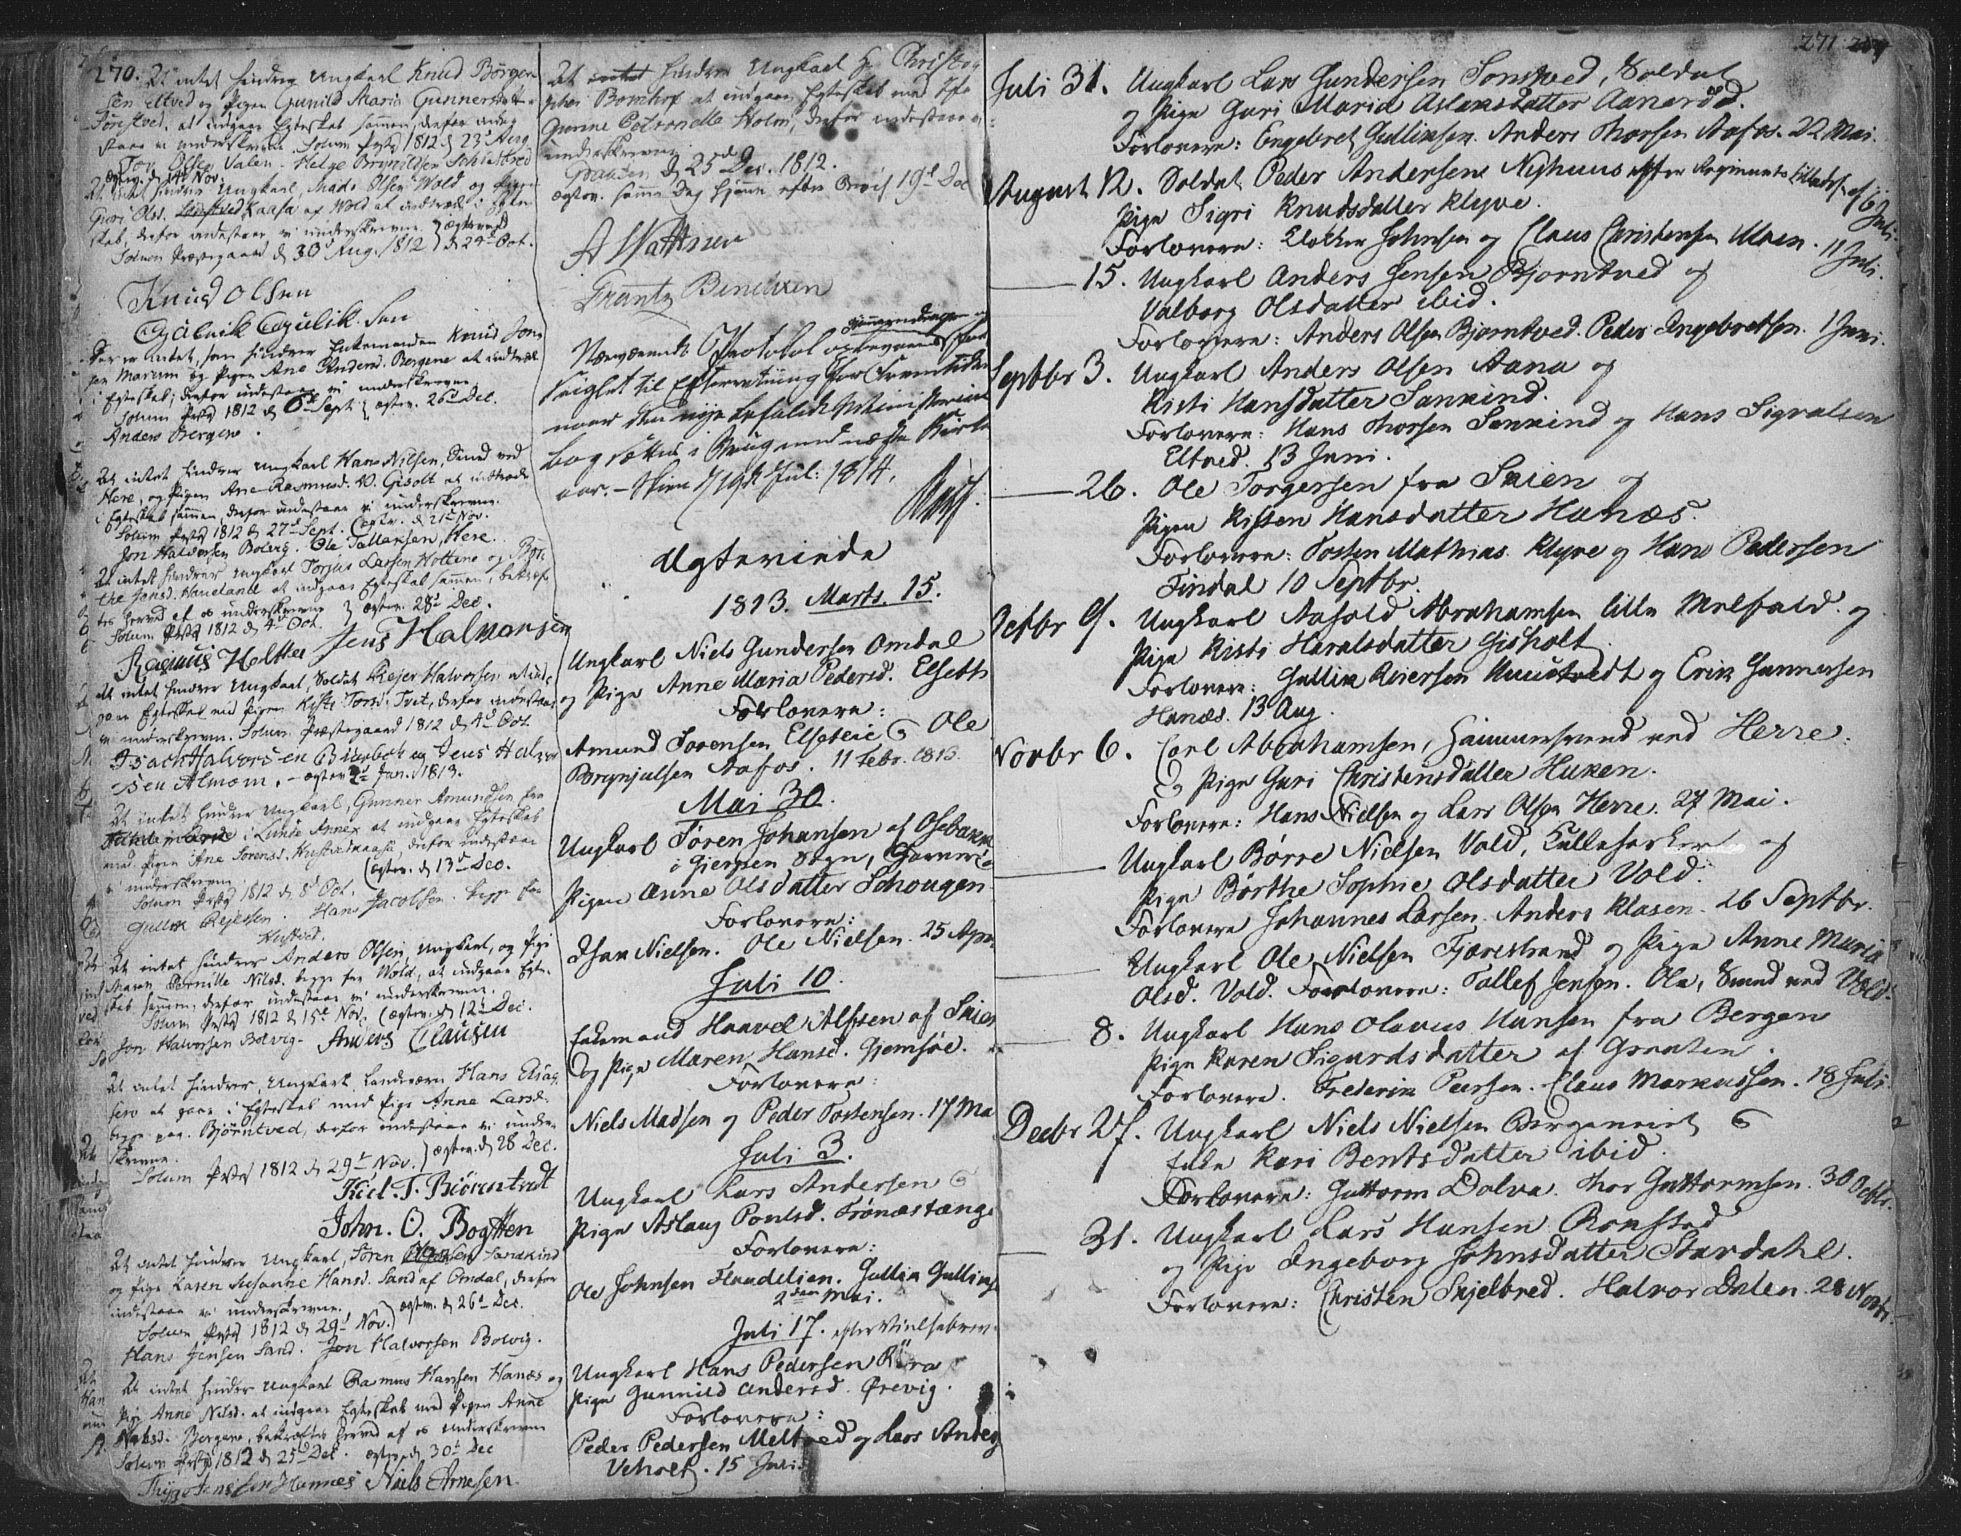 SAKO, Solum kirkebøker, F/Fa/L0003: Ministerialbok nr. I 3, 1761-1814, s. 270-271